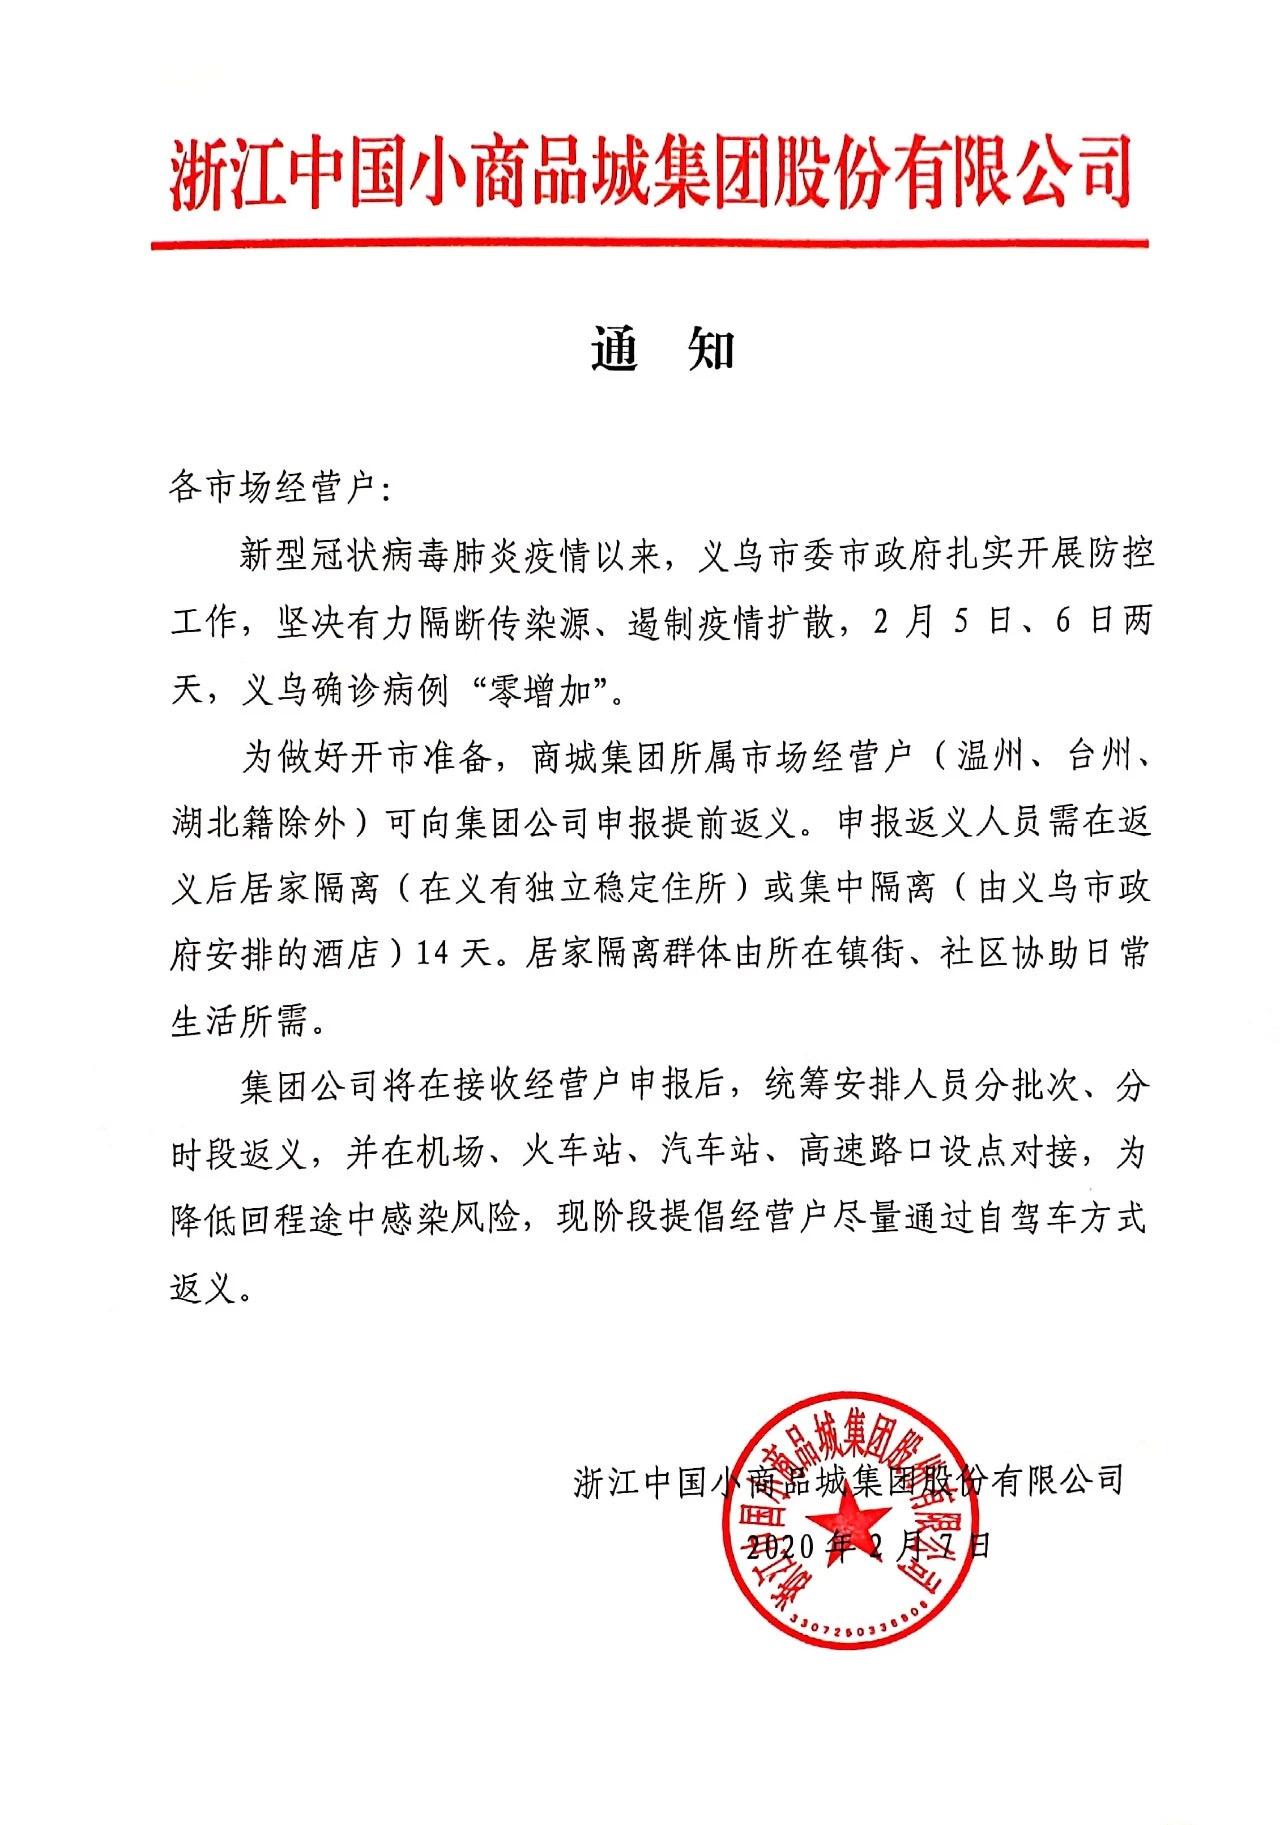 Yiwu Market Started Procedure to Open after Coronavirus Breakout